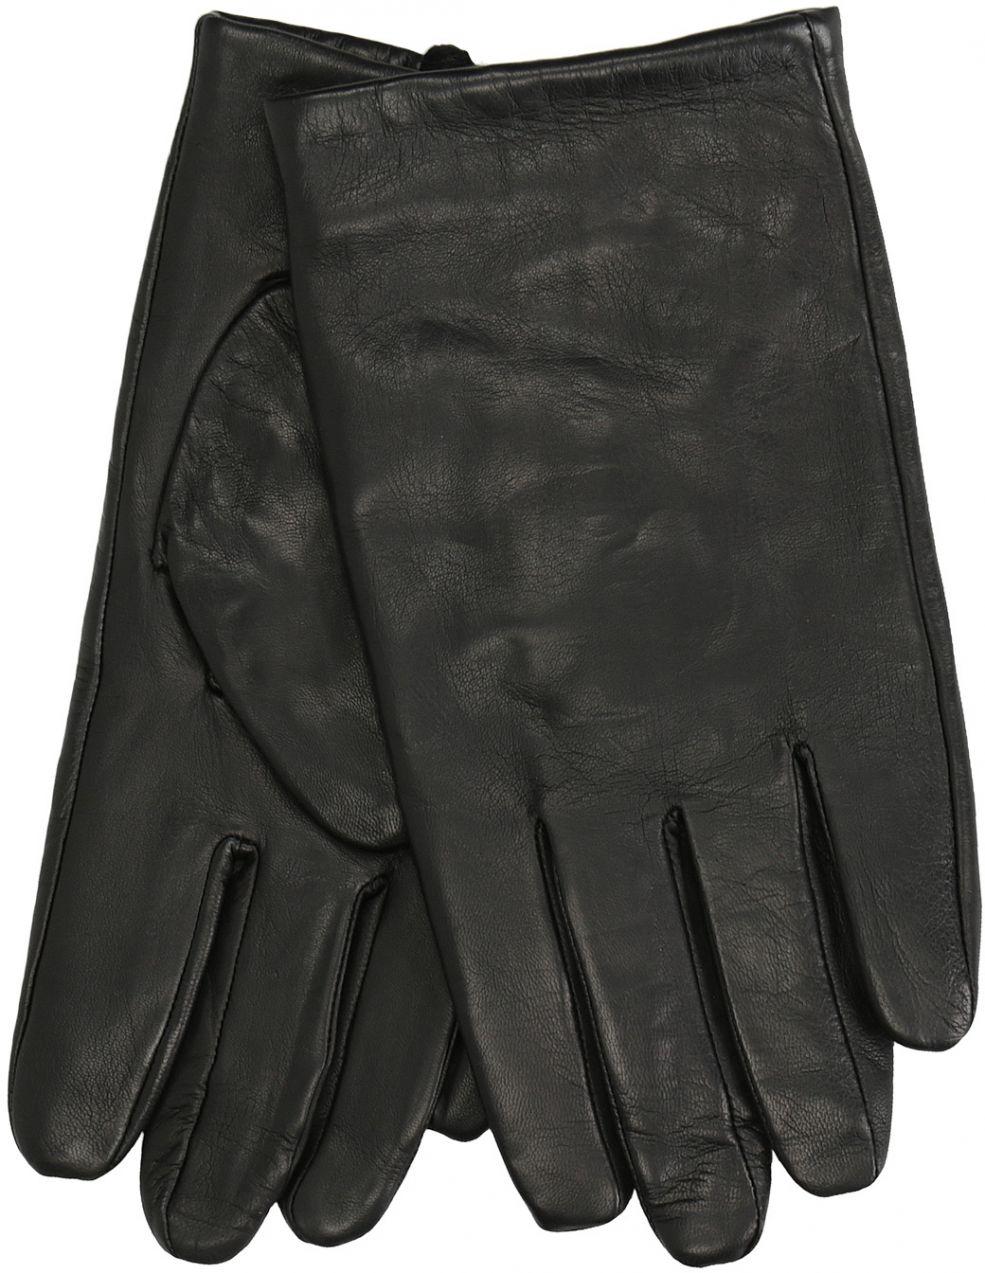 Kožené čierne rukavice značky Baťa - Lovely.sk 2fabc78f49